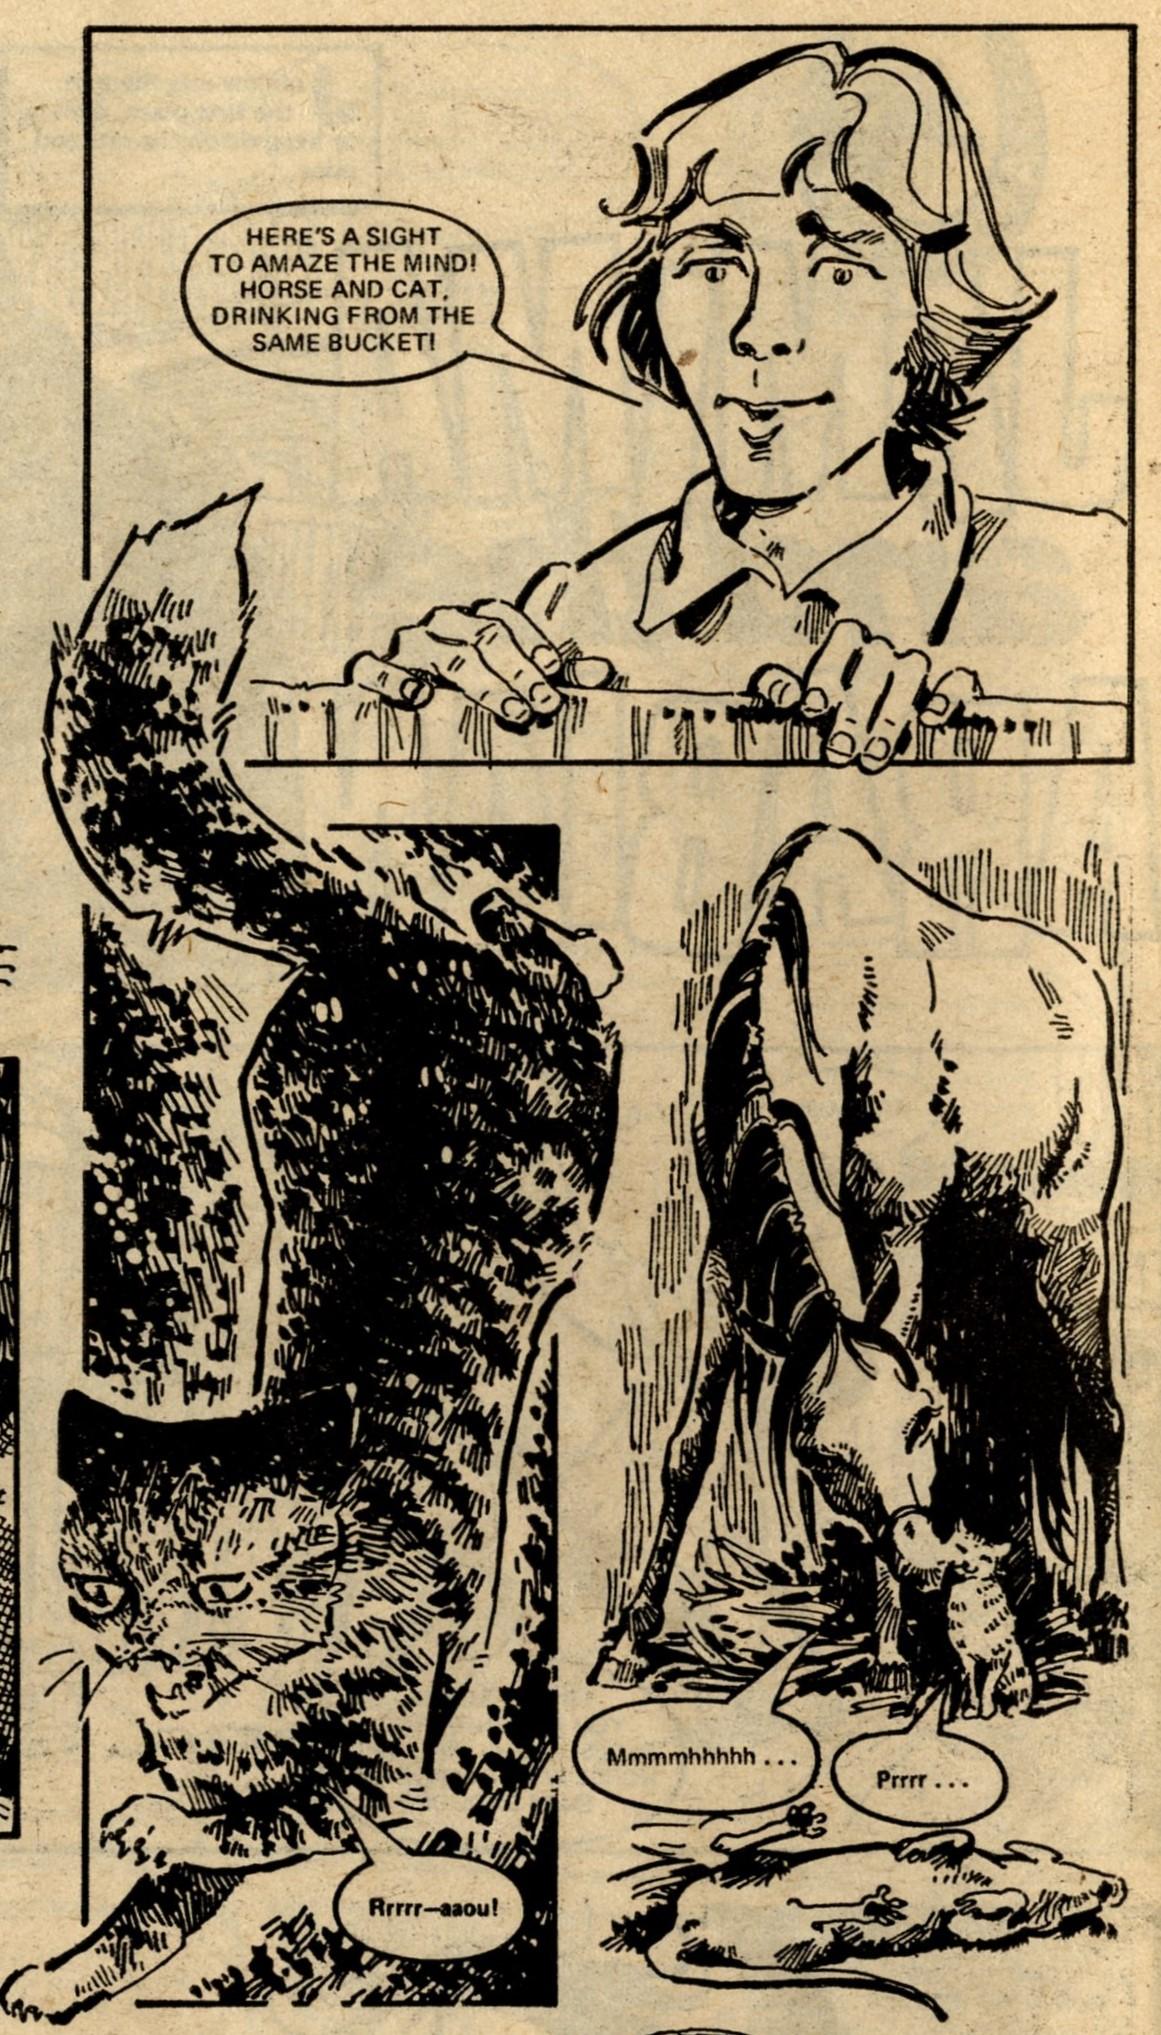 A Pony Tale: Jemima and the Arabian: Veronica Weir (artist)